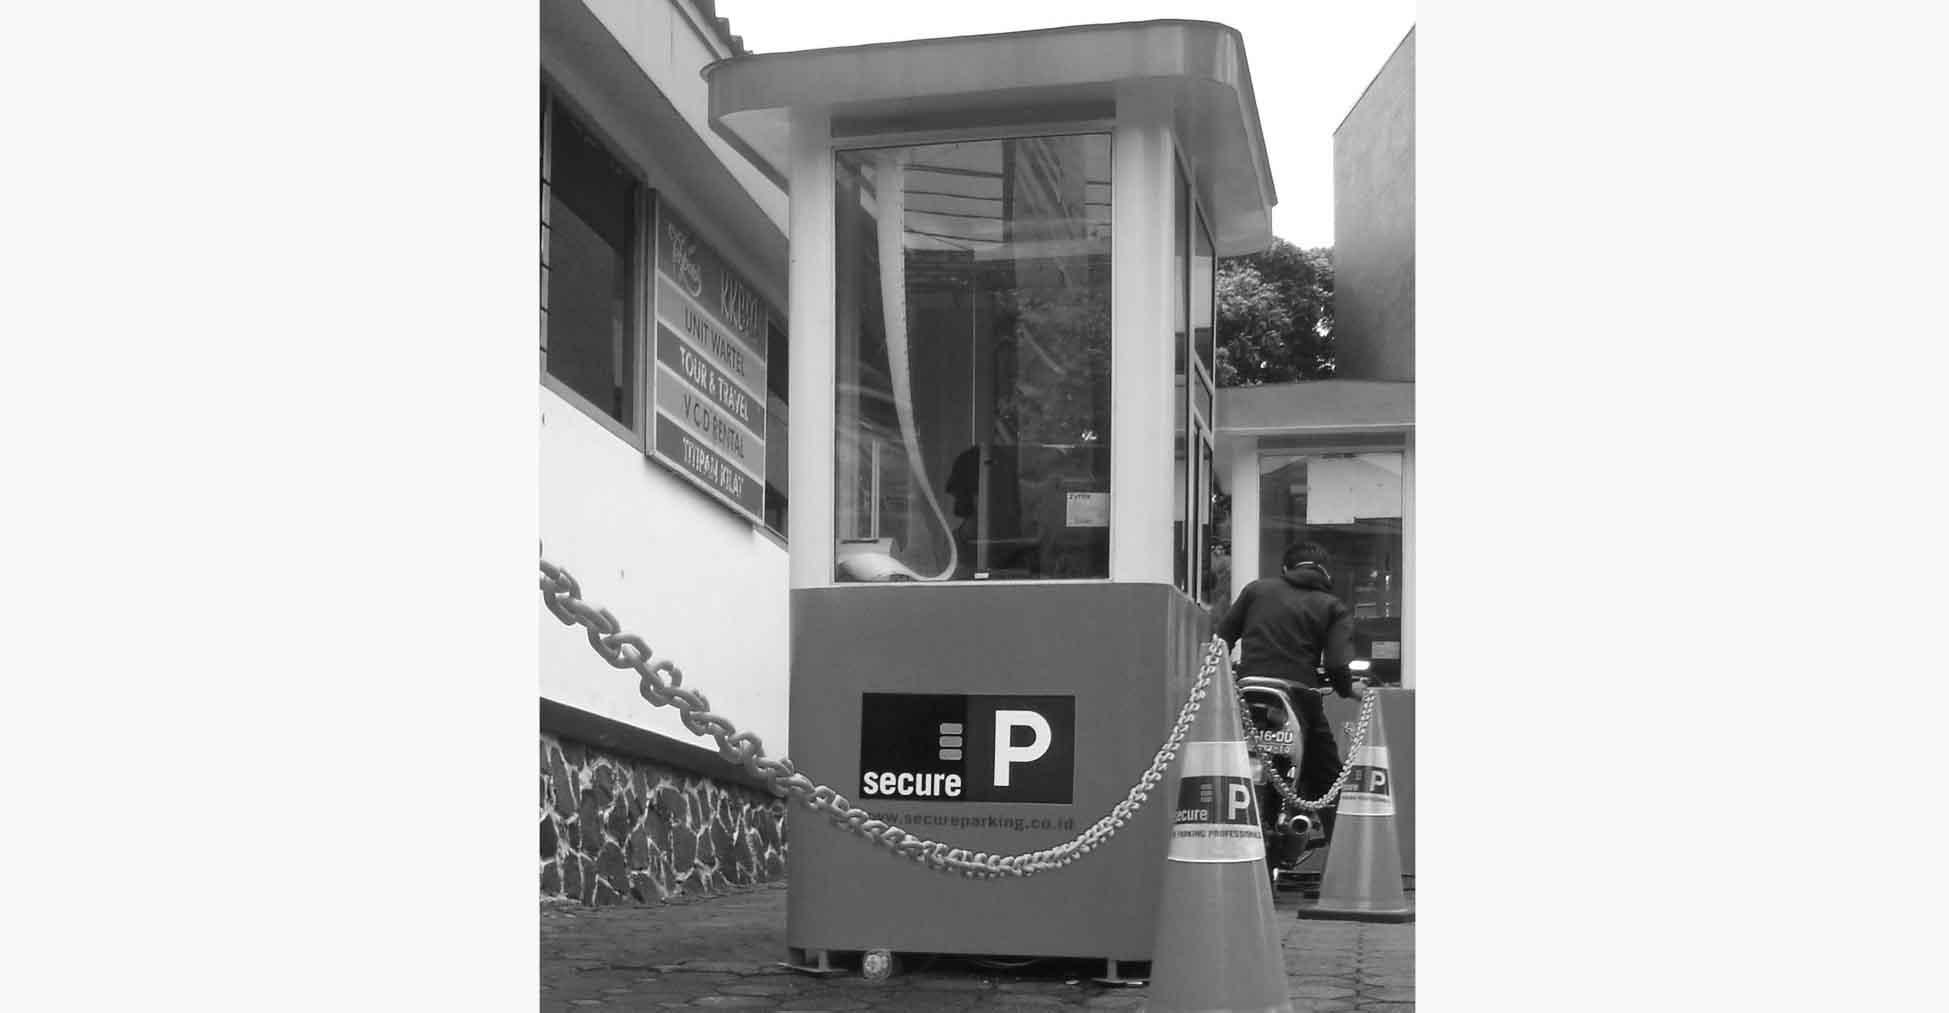 Box parkir secureparking Unpar. Dok/MP